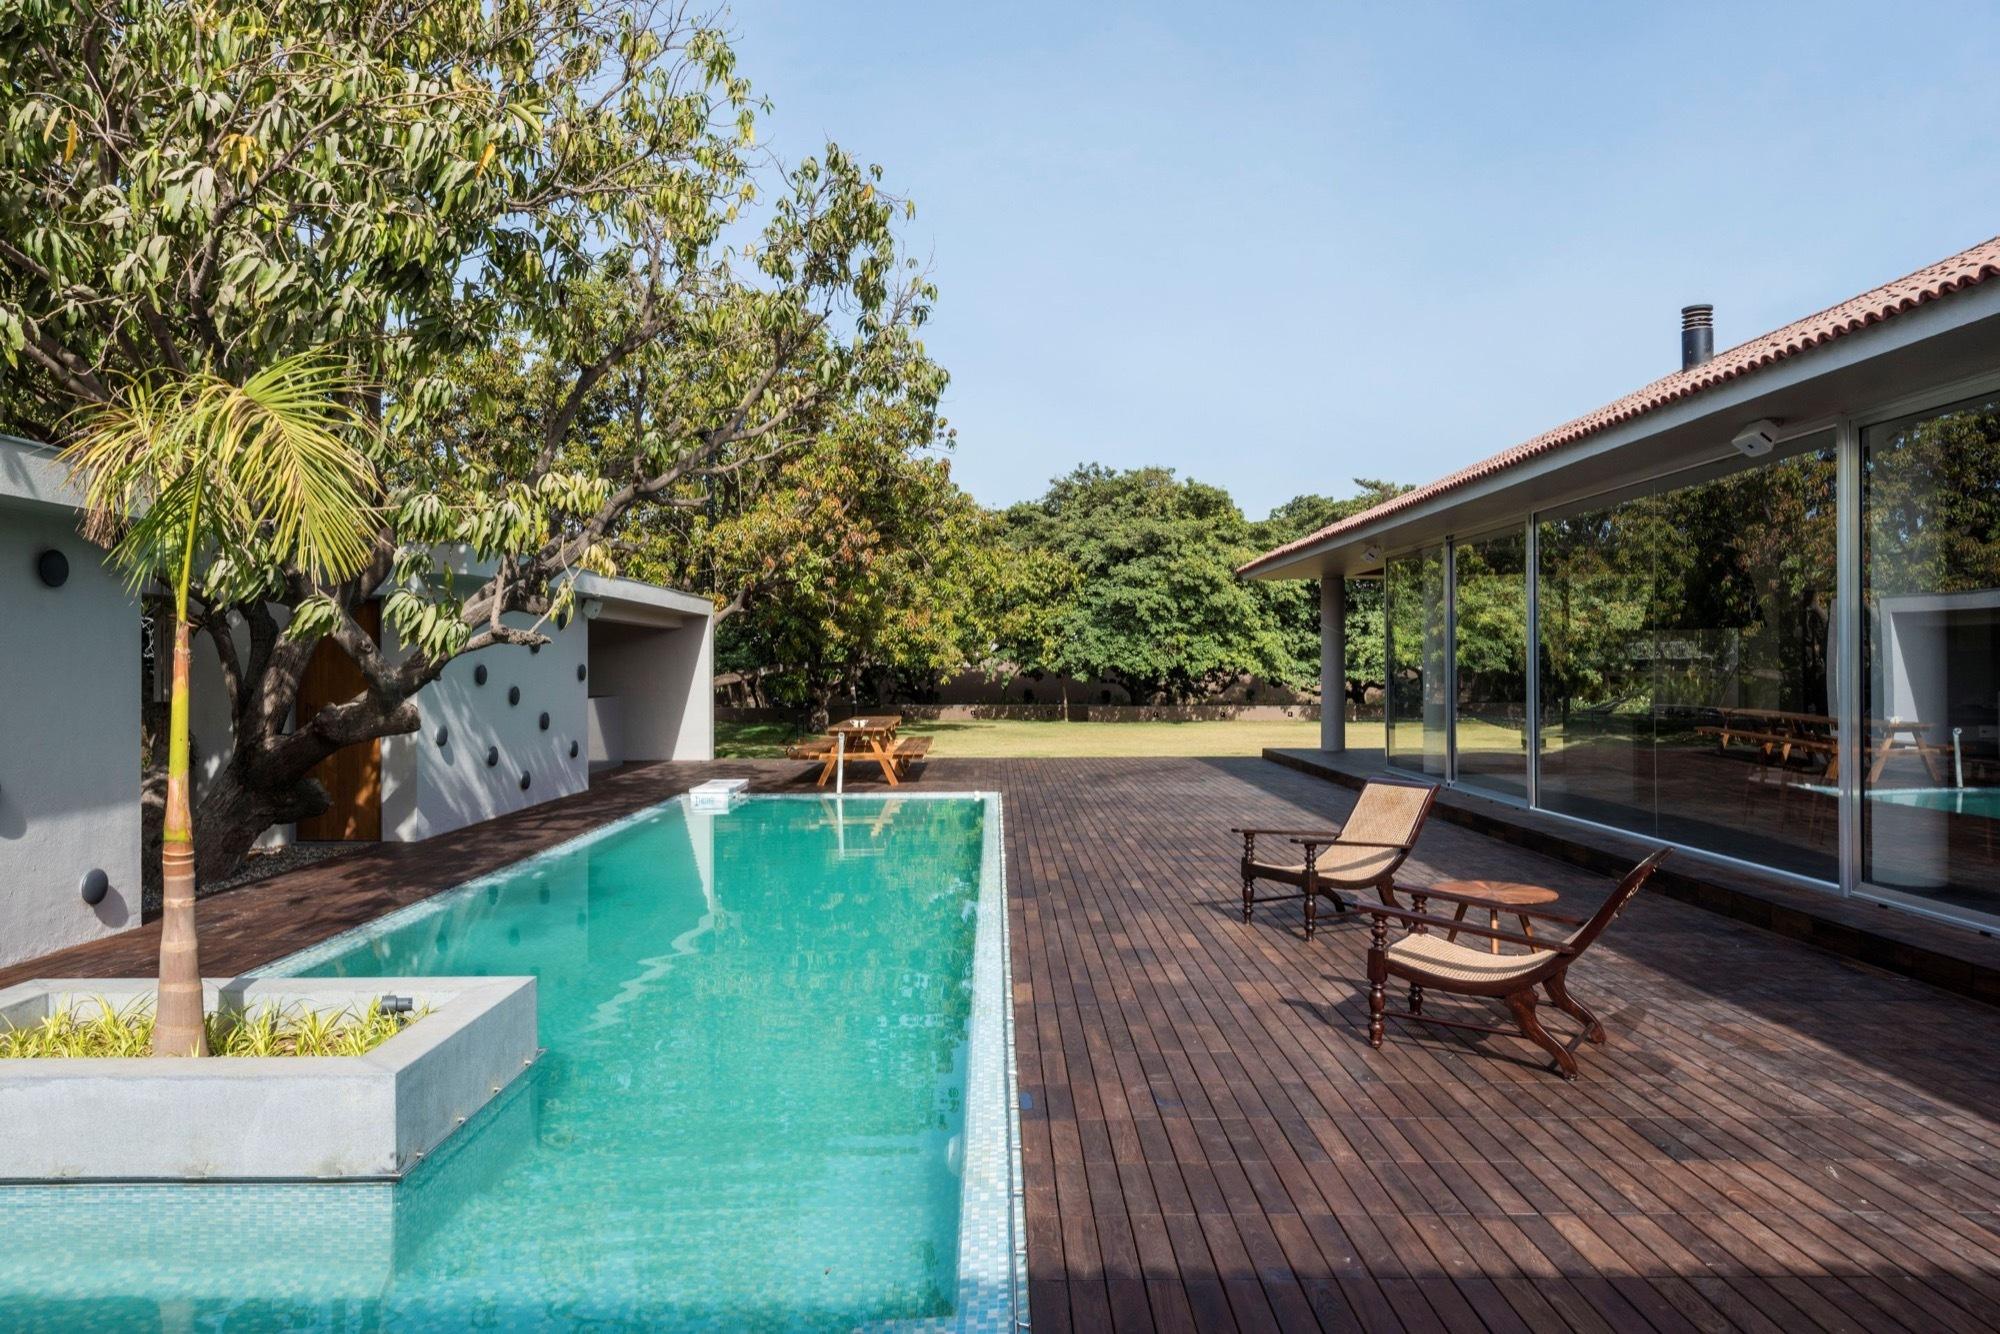 Galería de Casa tropical Urveel / Design Work Group - 21